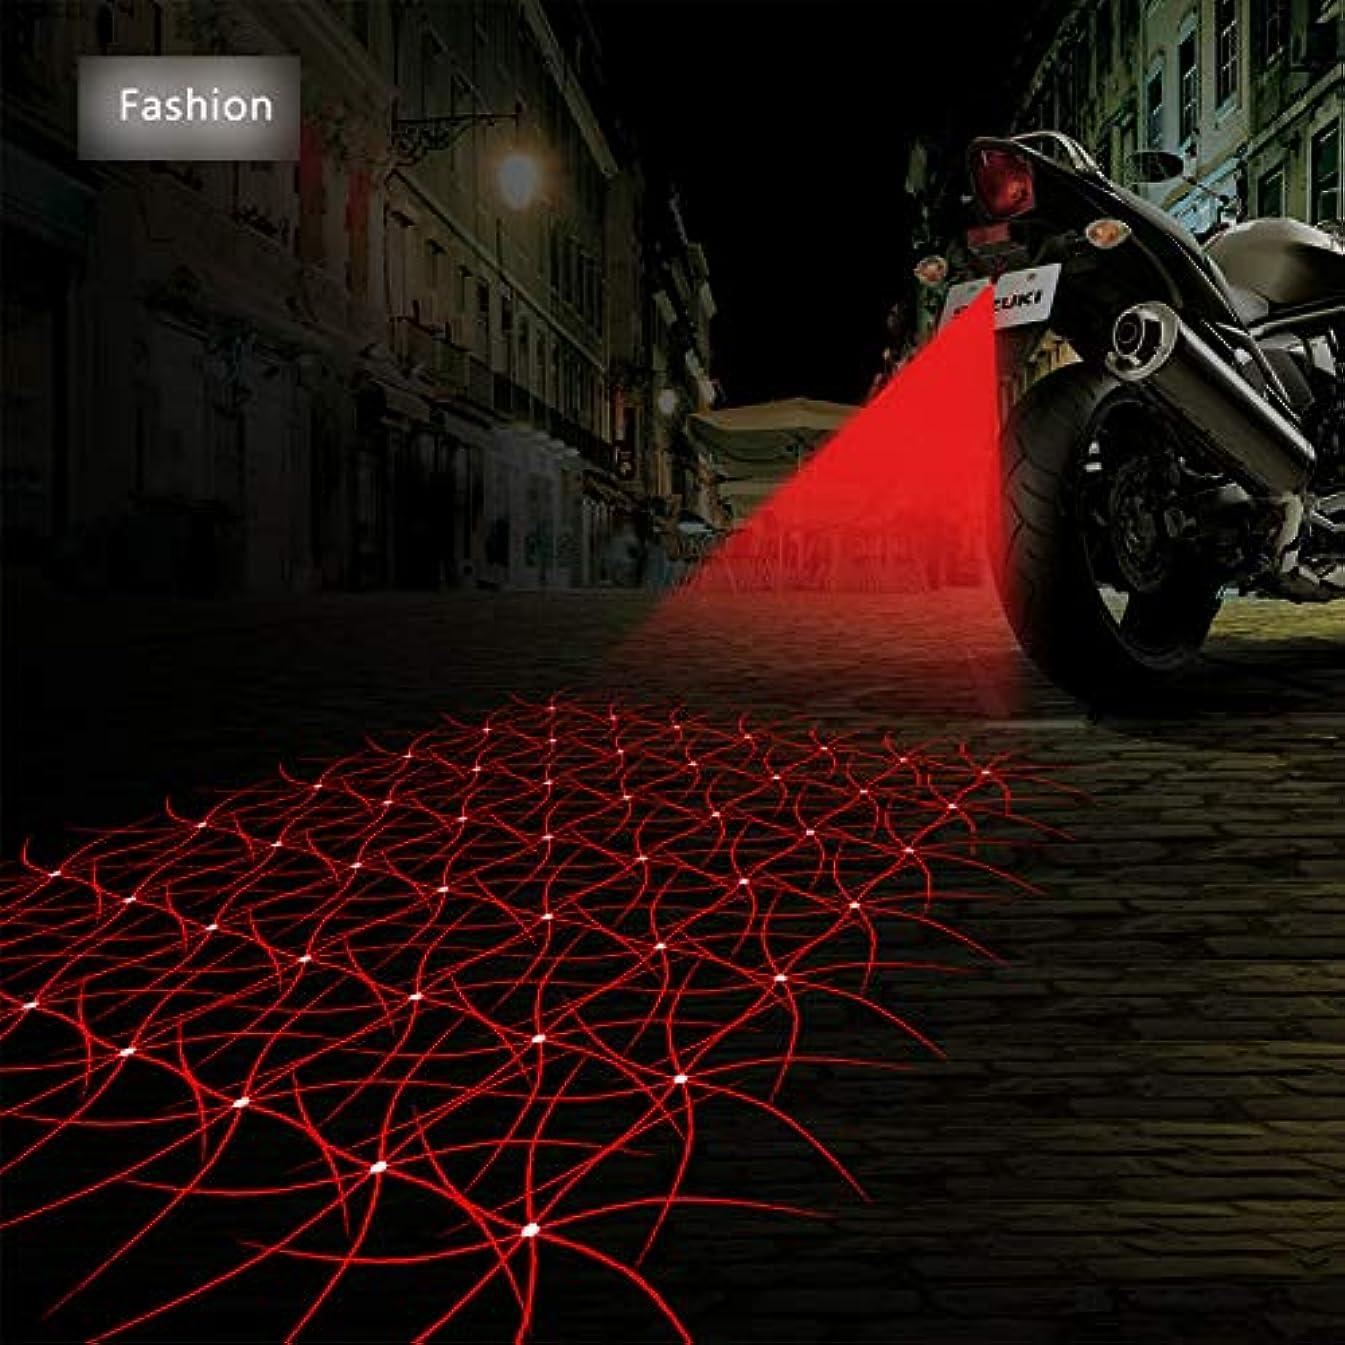 FOLCONROAD Anti Collision Rear-end Car Laser Tail Fog Light Auto Brake Parking Lamp Rearing Warning Light Motorcycle[Fashion][US Warehouse]